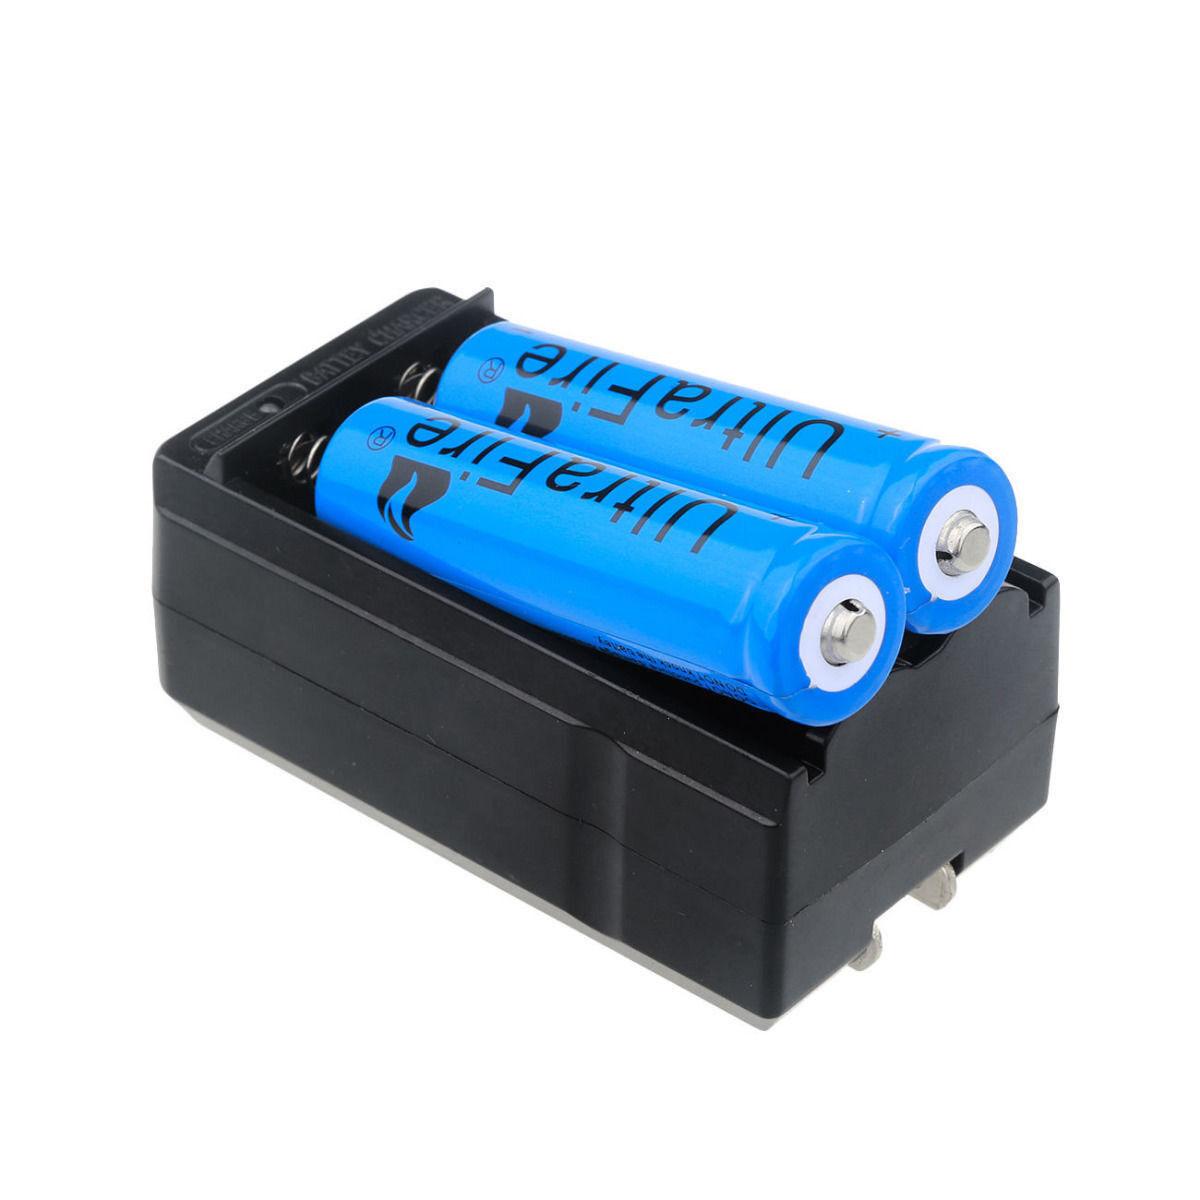 2pc UltraFire 3000mAh 18650 Battery 3.7v Li-ion Rechargeable